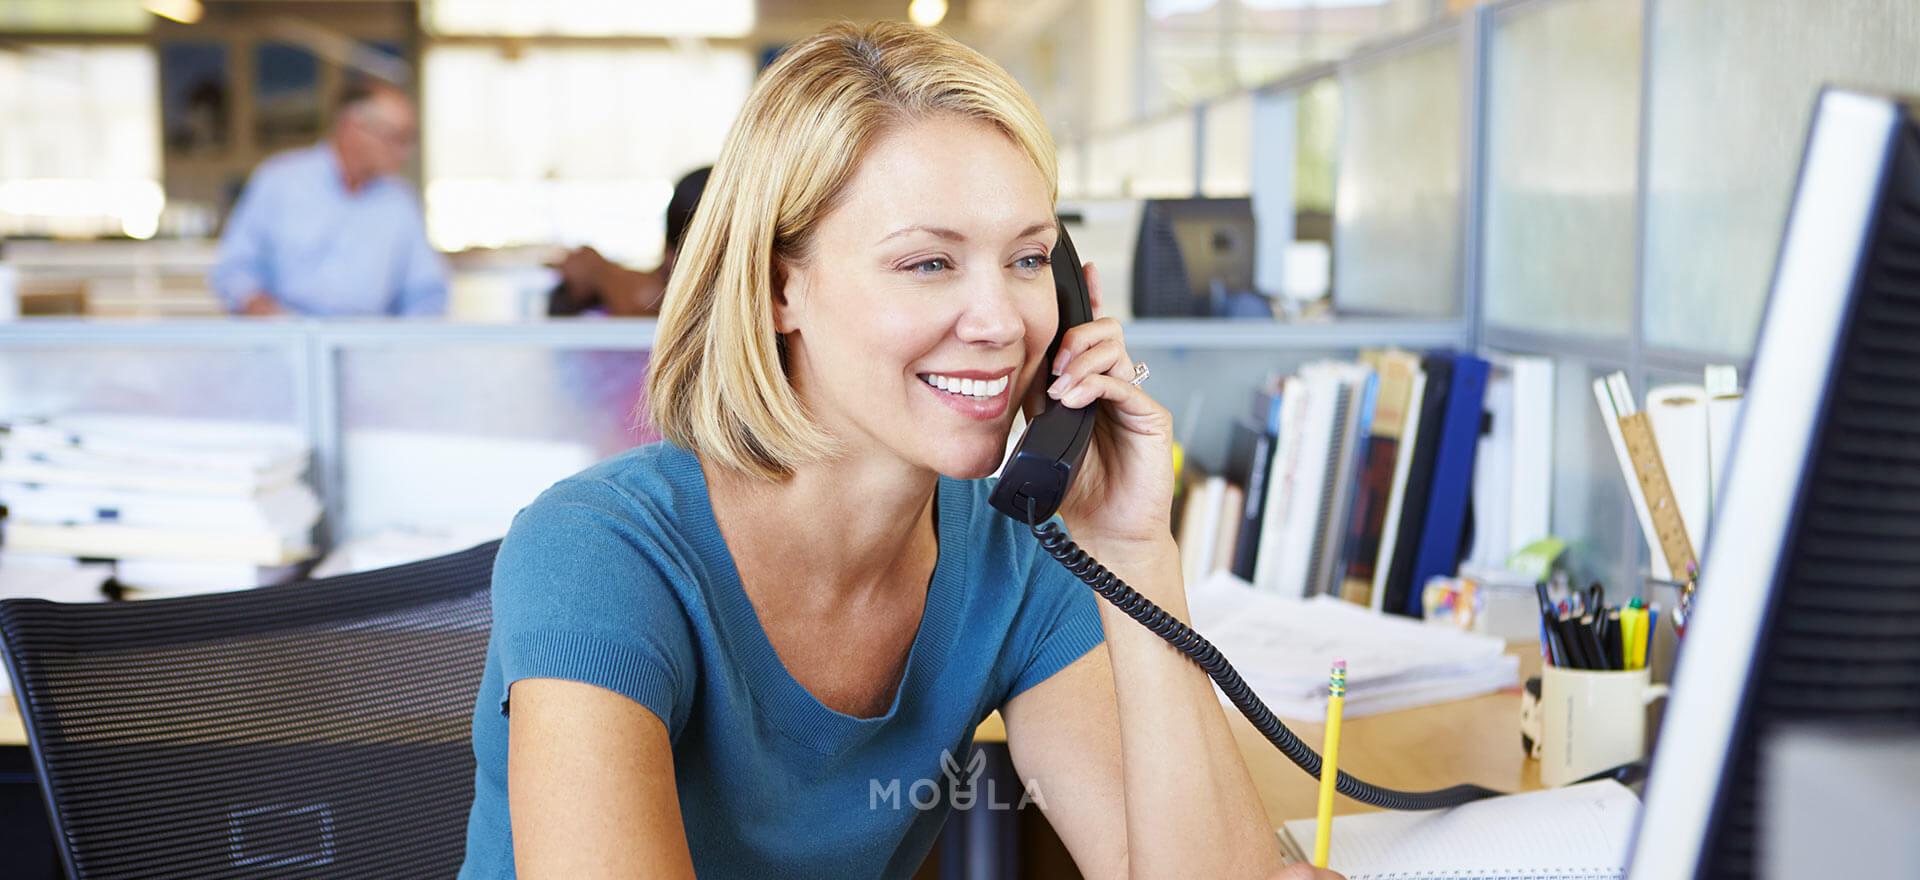 Client discussing business lending solution